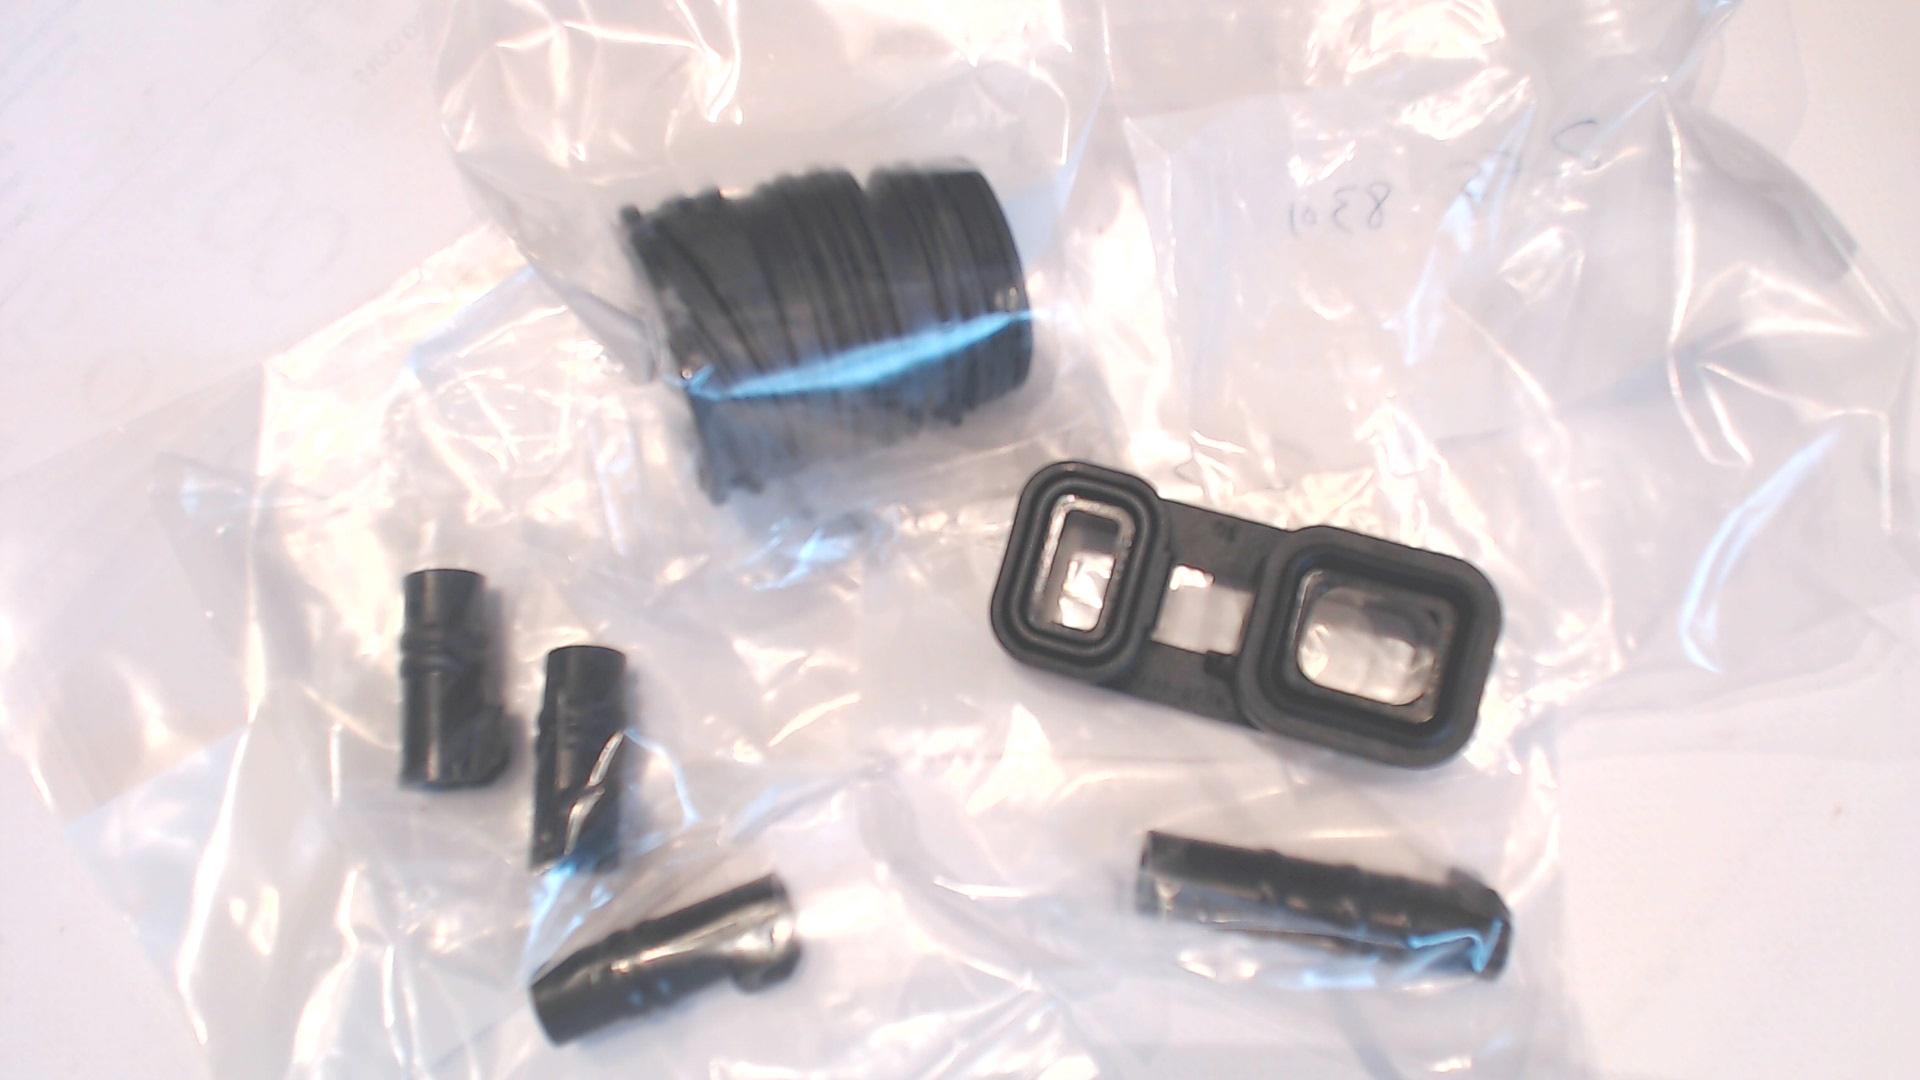 AUTOKAY New 4PCS 6HP19 6HP21 Valve Body to Case Sleeve Seal Kit for BMW